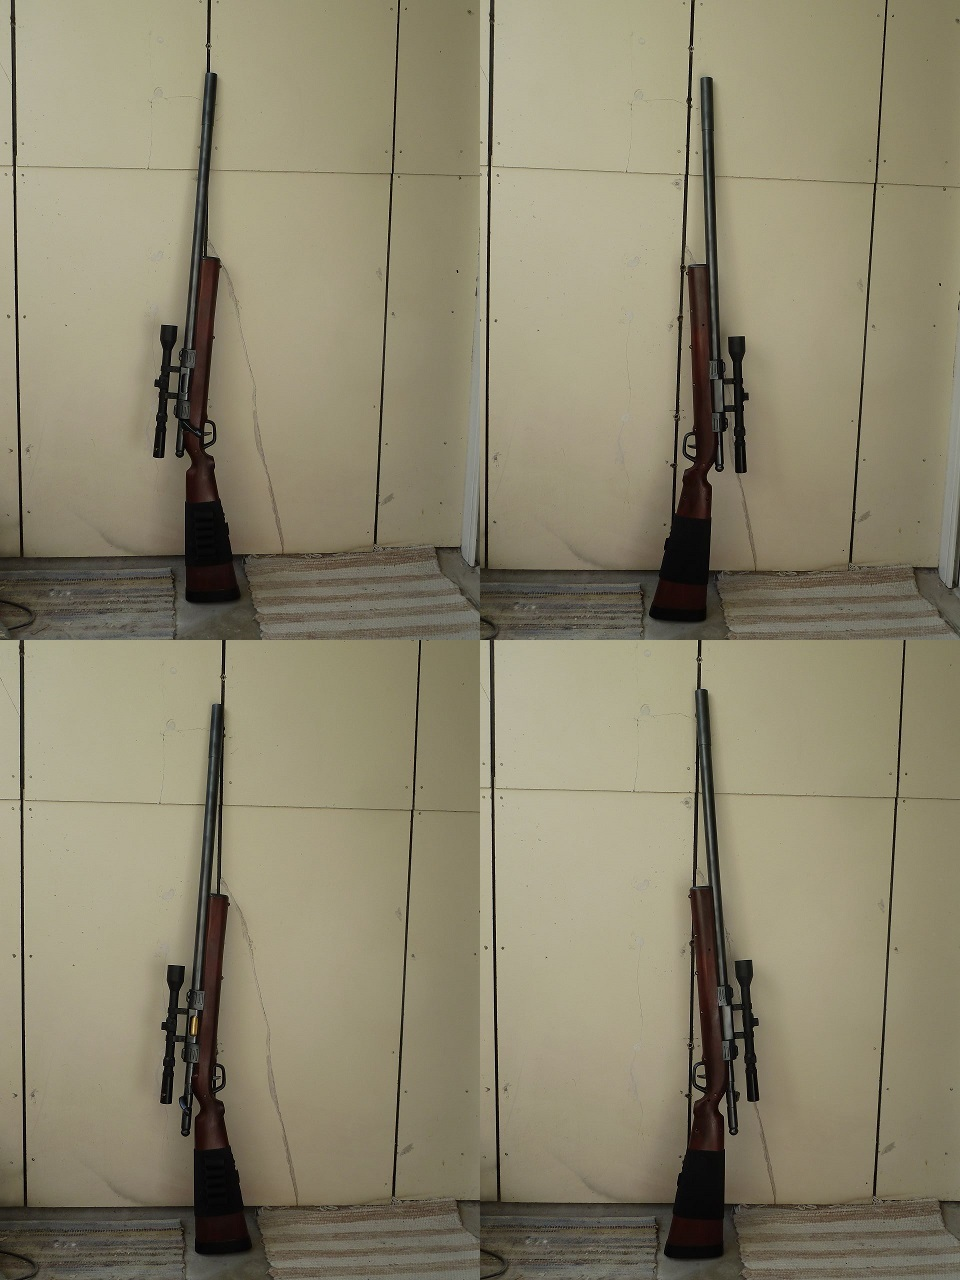 Rscb Buzzbee Hunter Bolt Action Nerf Rifle By Hoellenhamster On Deviantart